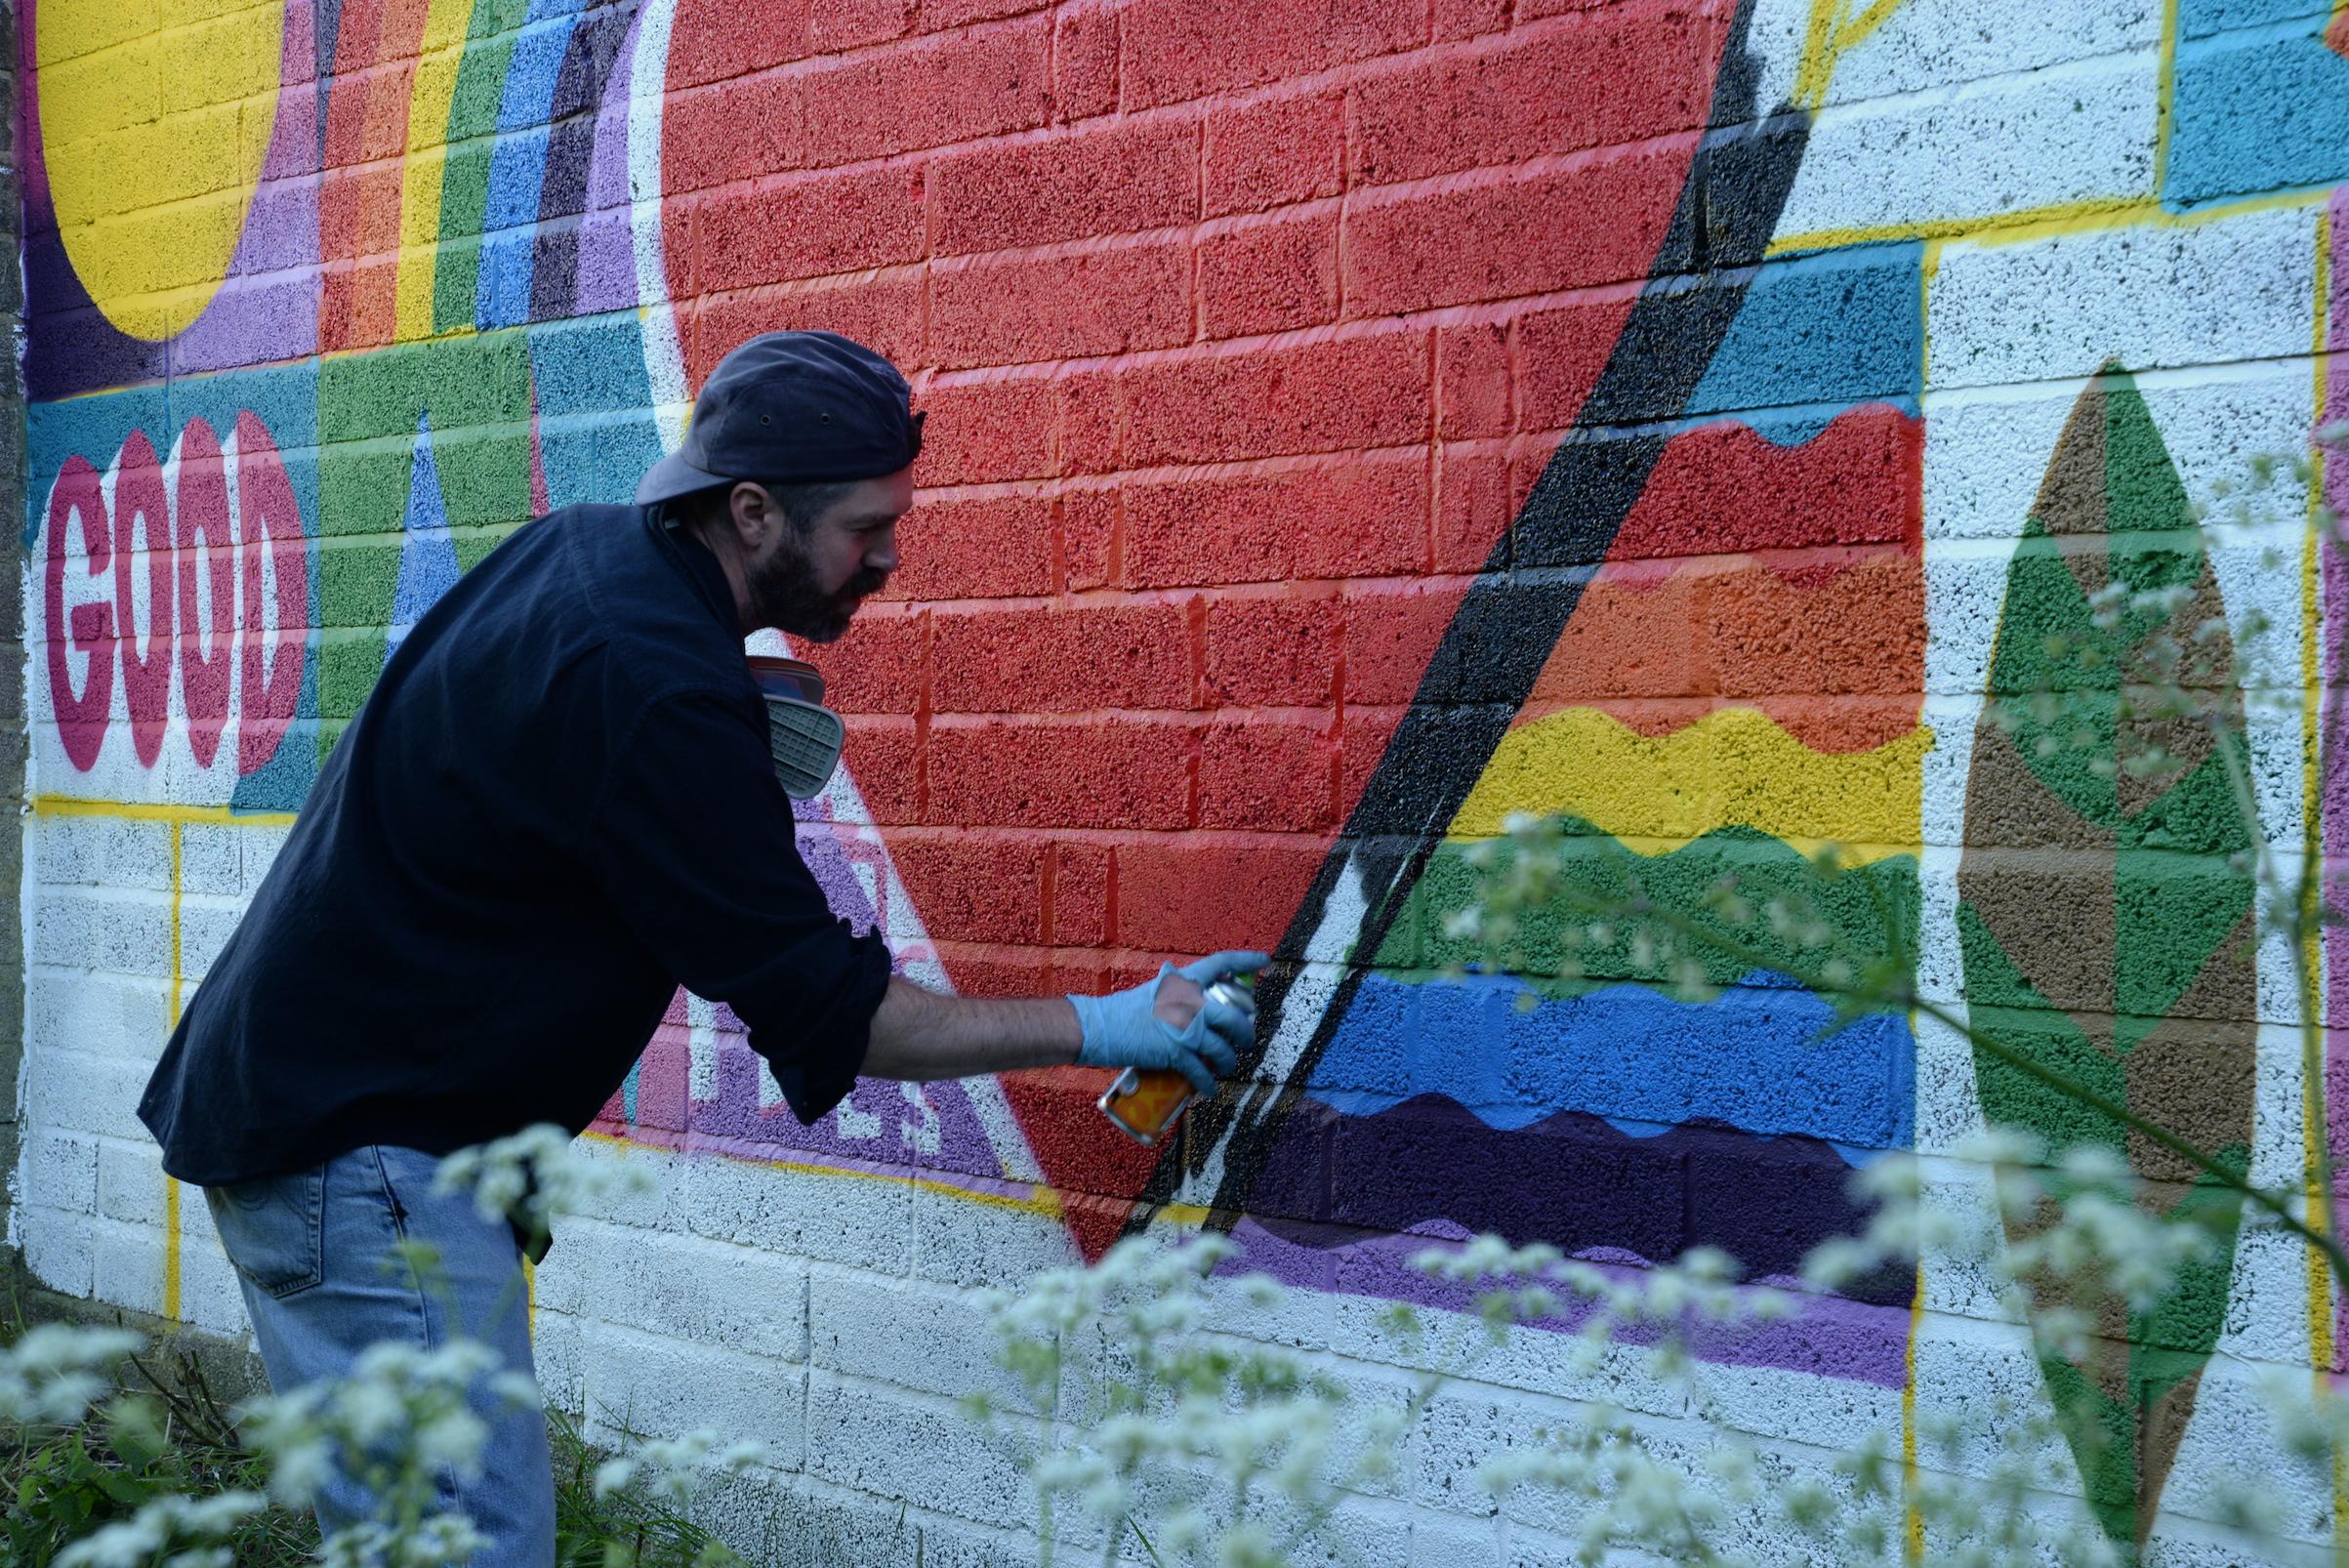 Luke Embden painting near manor house road May 2021